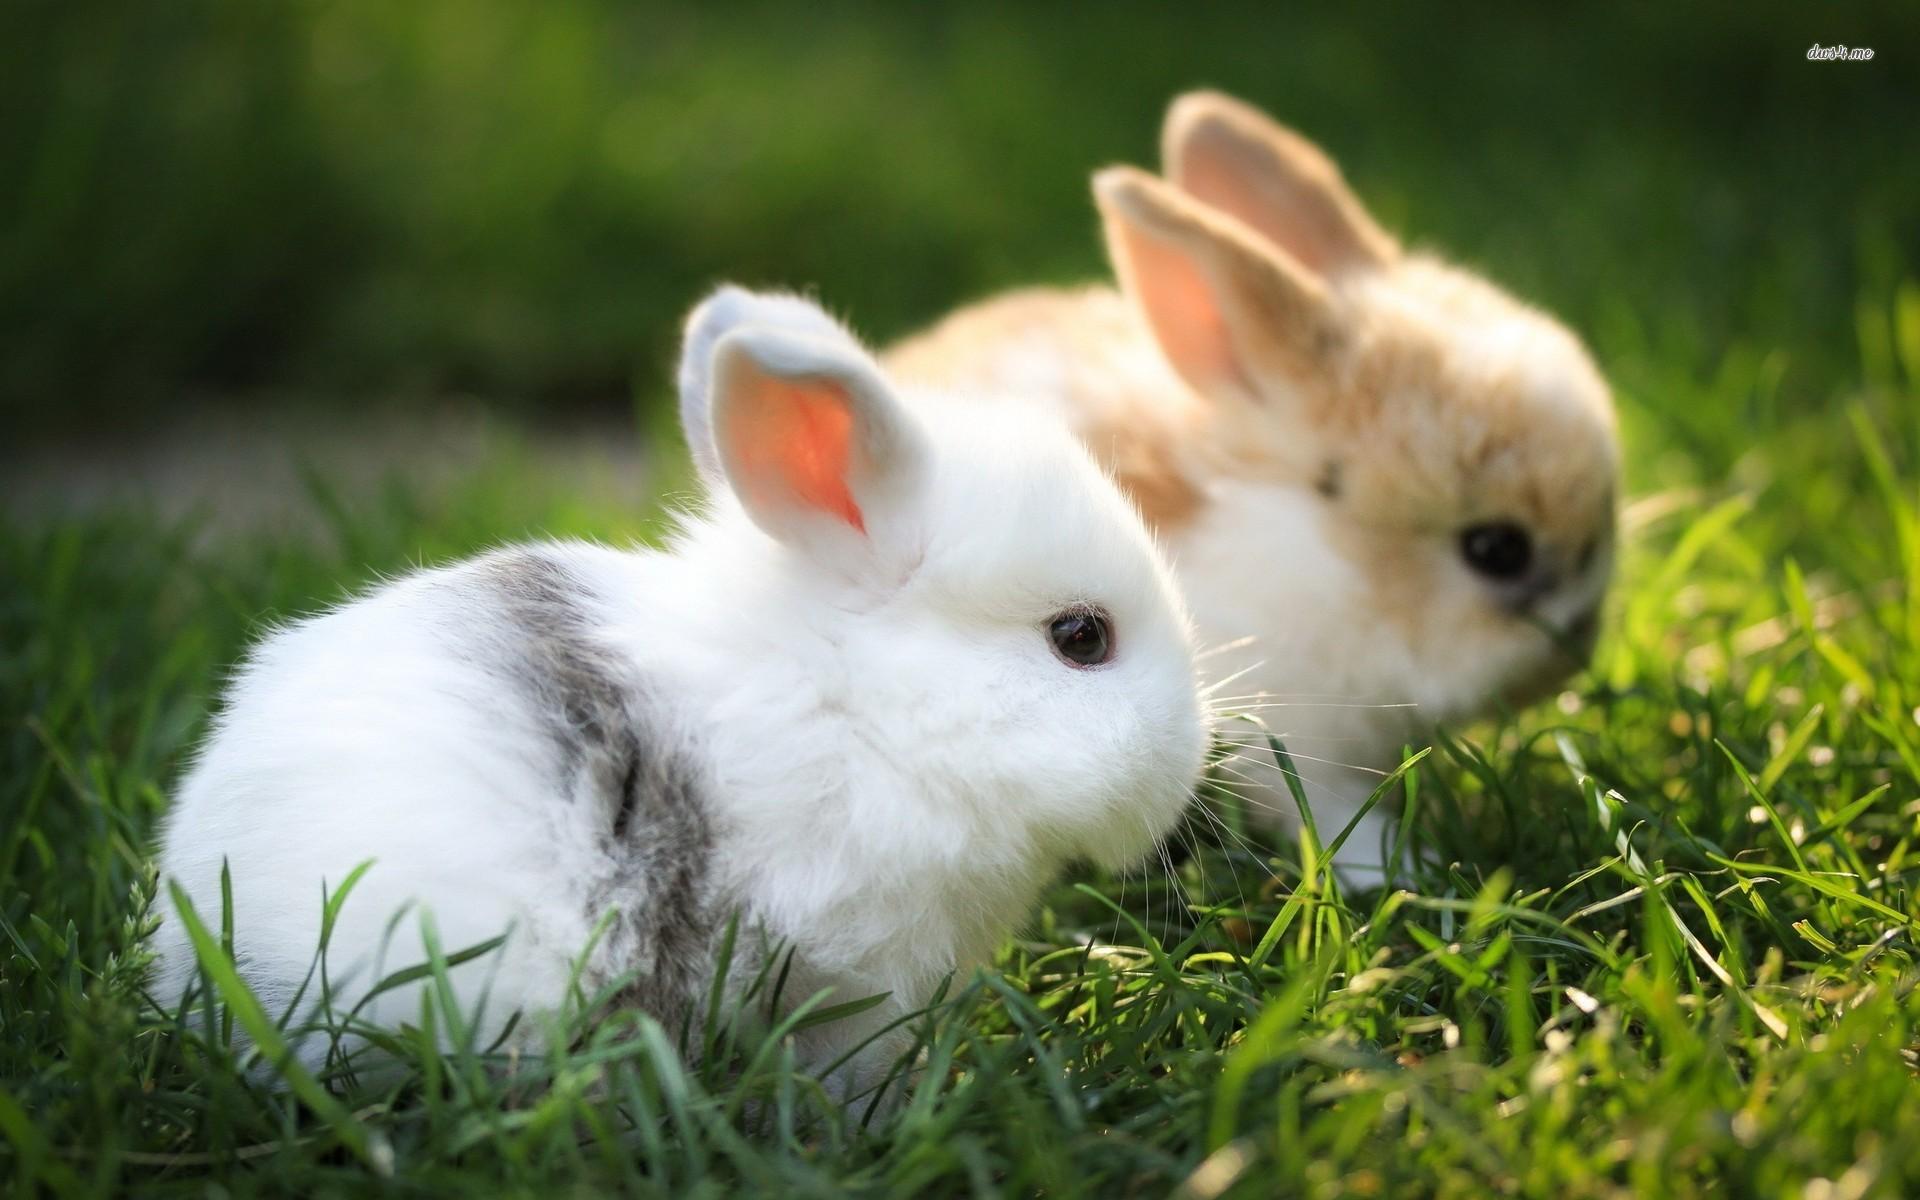 27 Cute White Baby Rabbit Wallpaper On Wallpapersafari